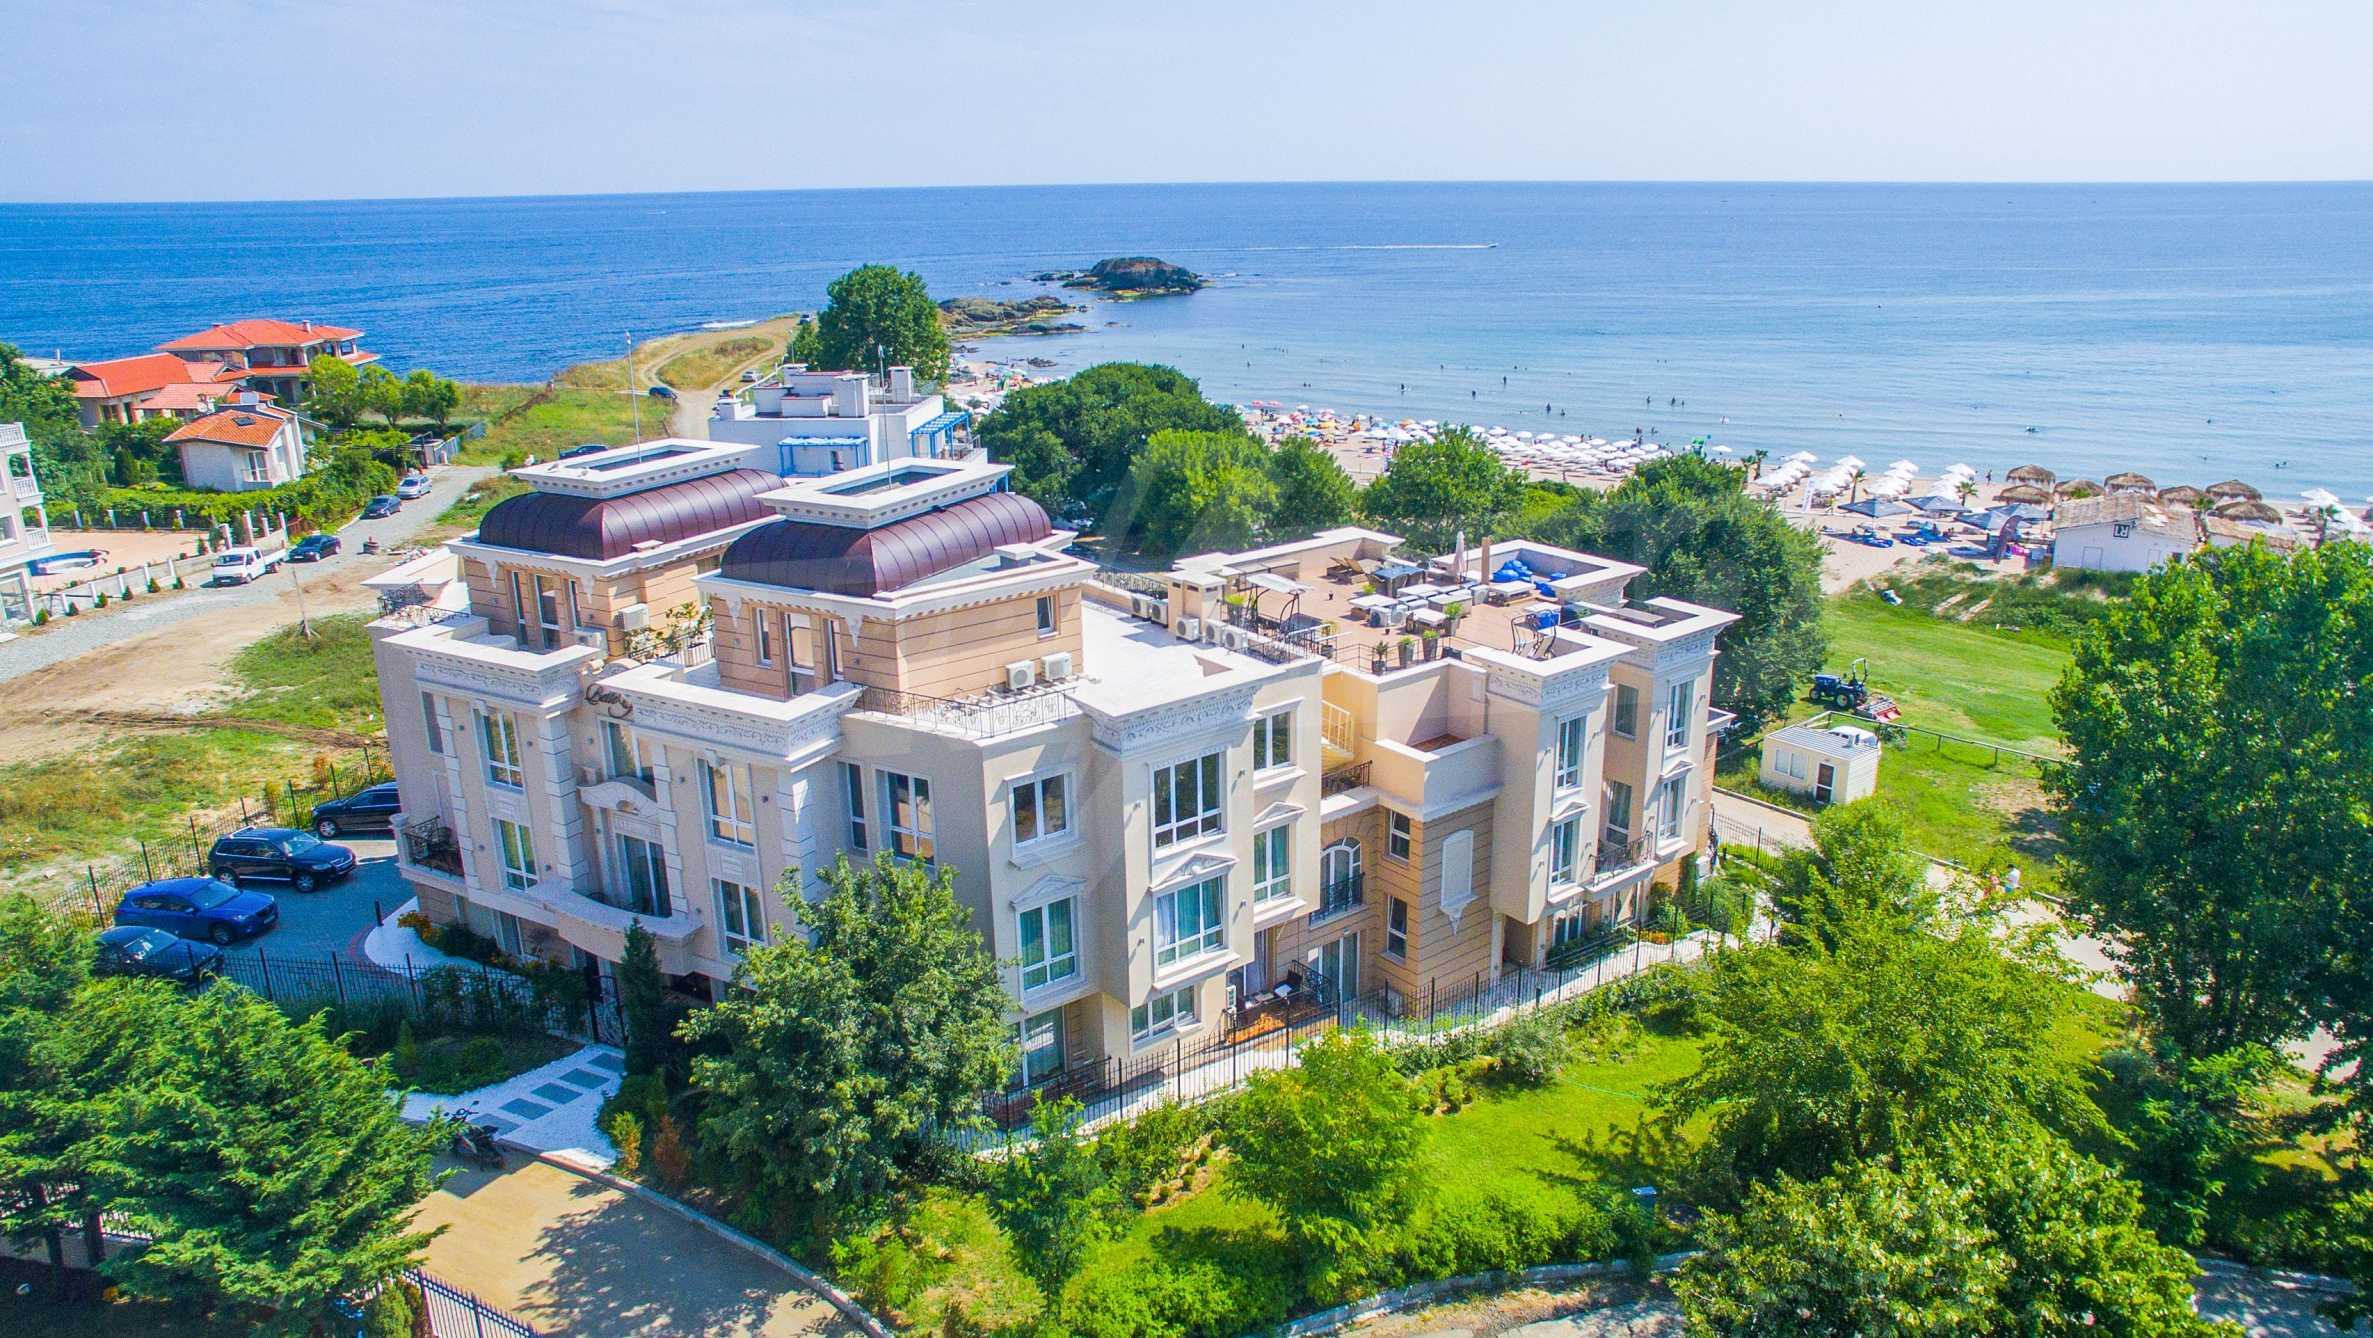 Първокласен двустаен апартамент в Belle Époque Beach Residence (ап. №A 206) 4